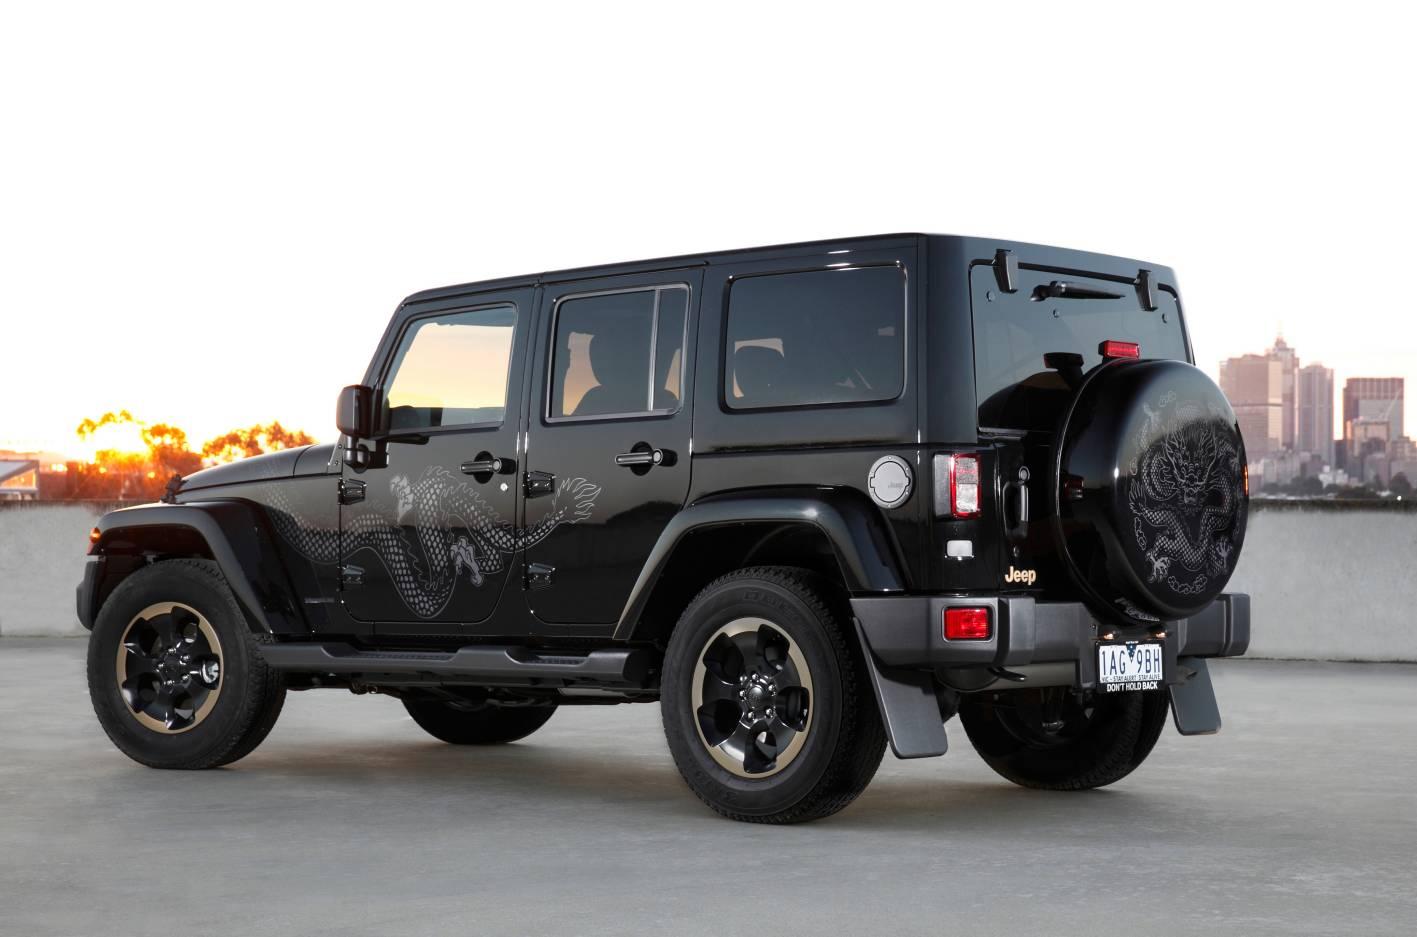 Dragon jeep wrangler #4